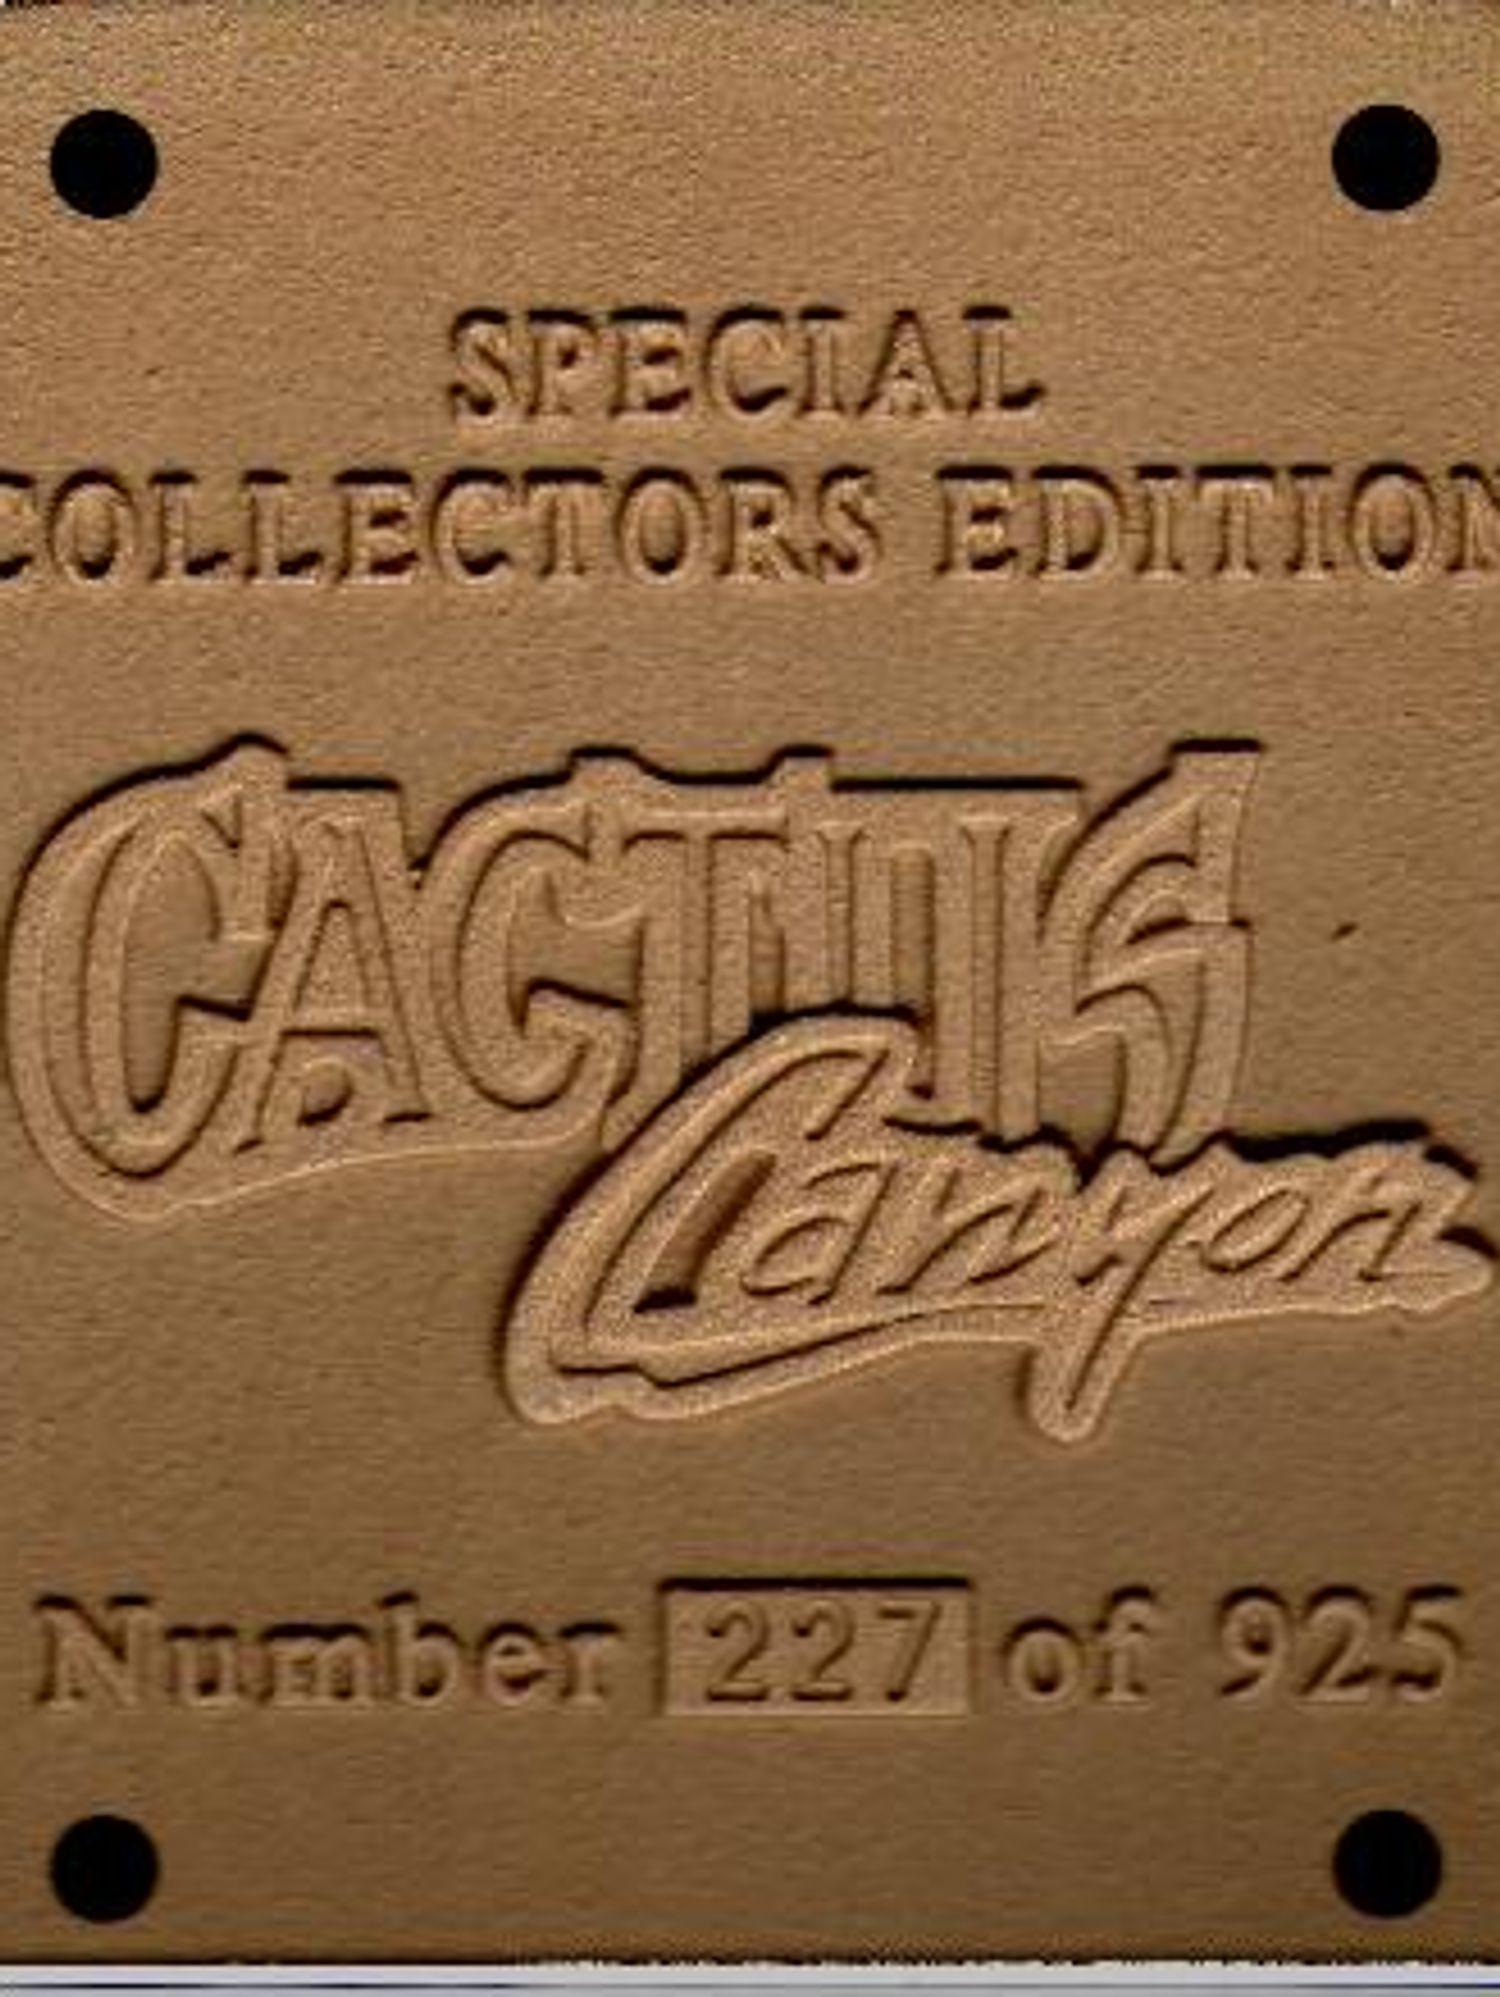 Cactus Canyon Collectors Plaque